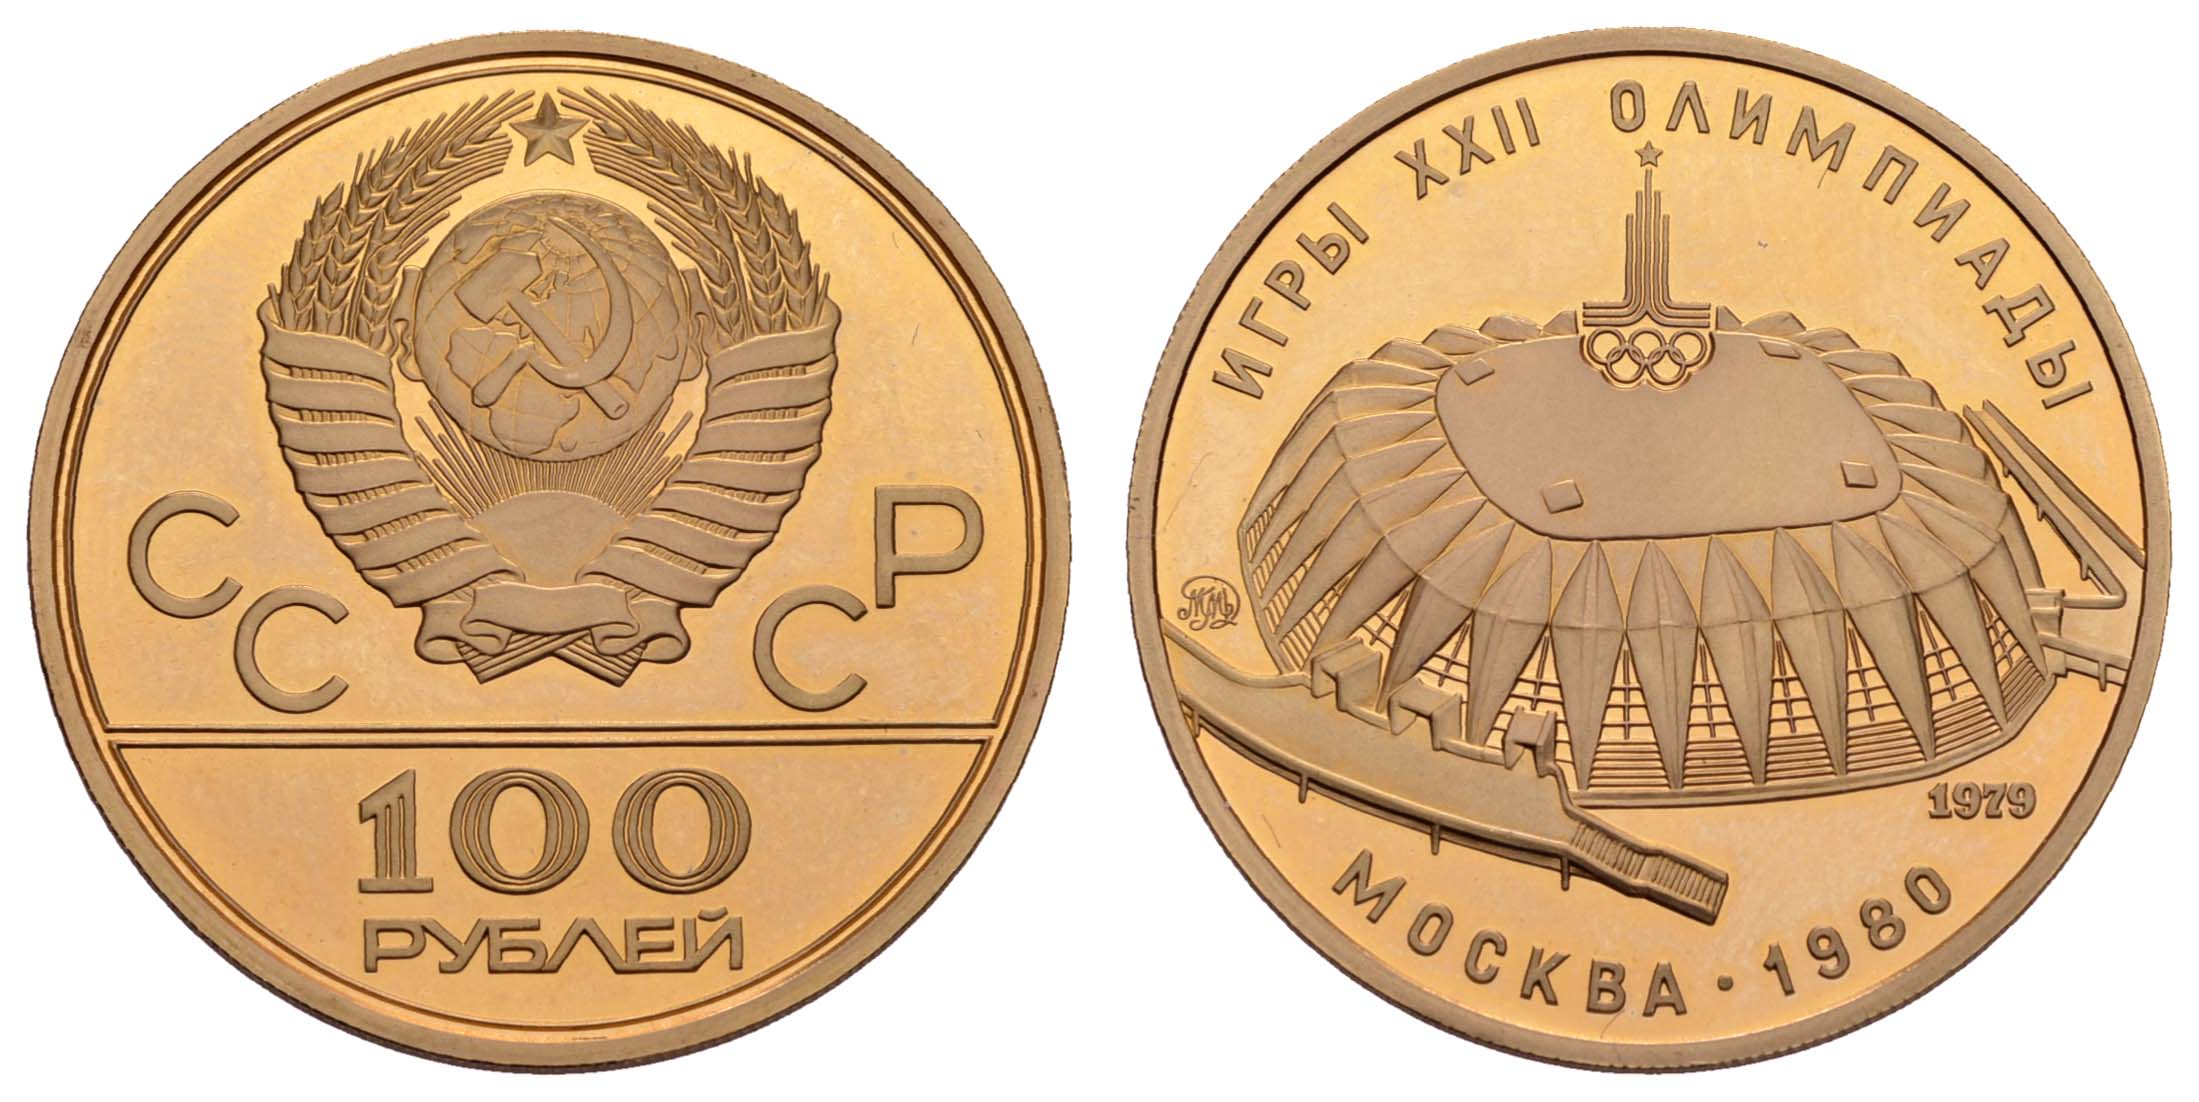 Lot 1765 - europa ab 1800 - Russland -  Auktionshaus Ulrich Felzmann GmbH & Co. KG Coins single lots